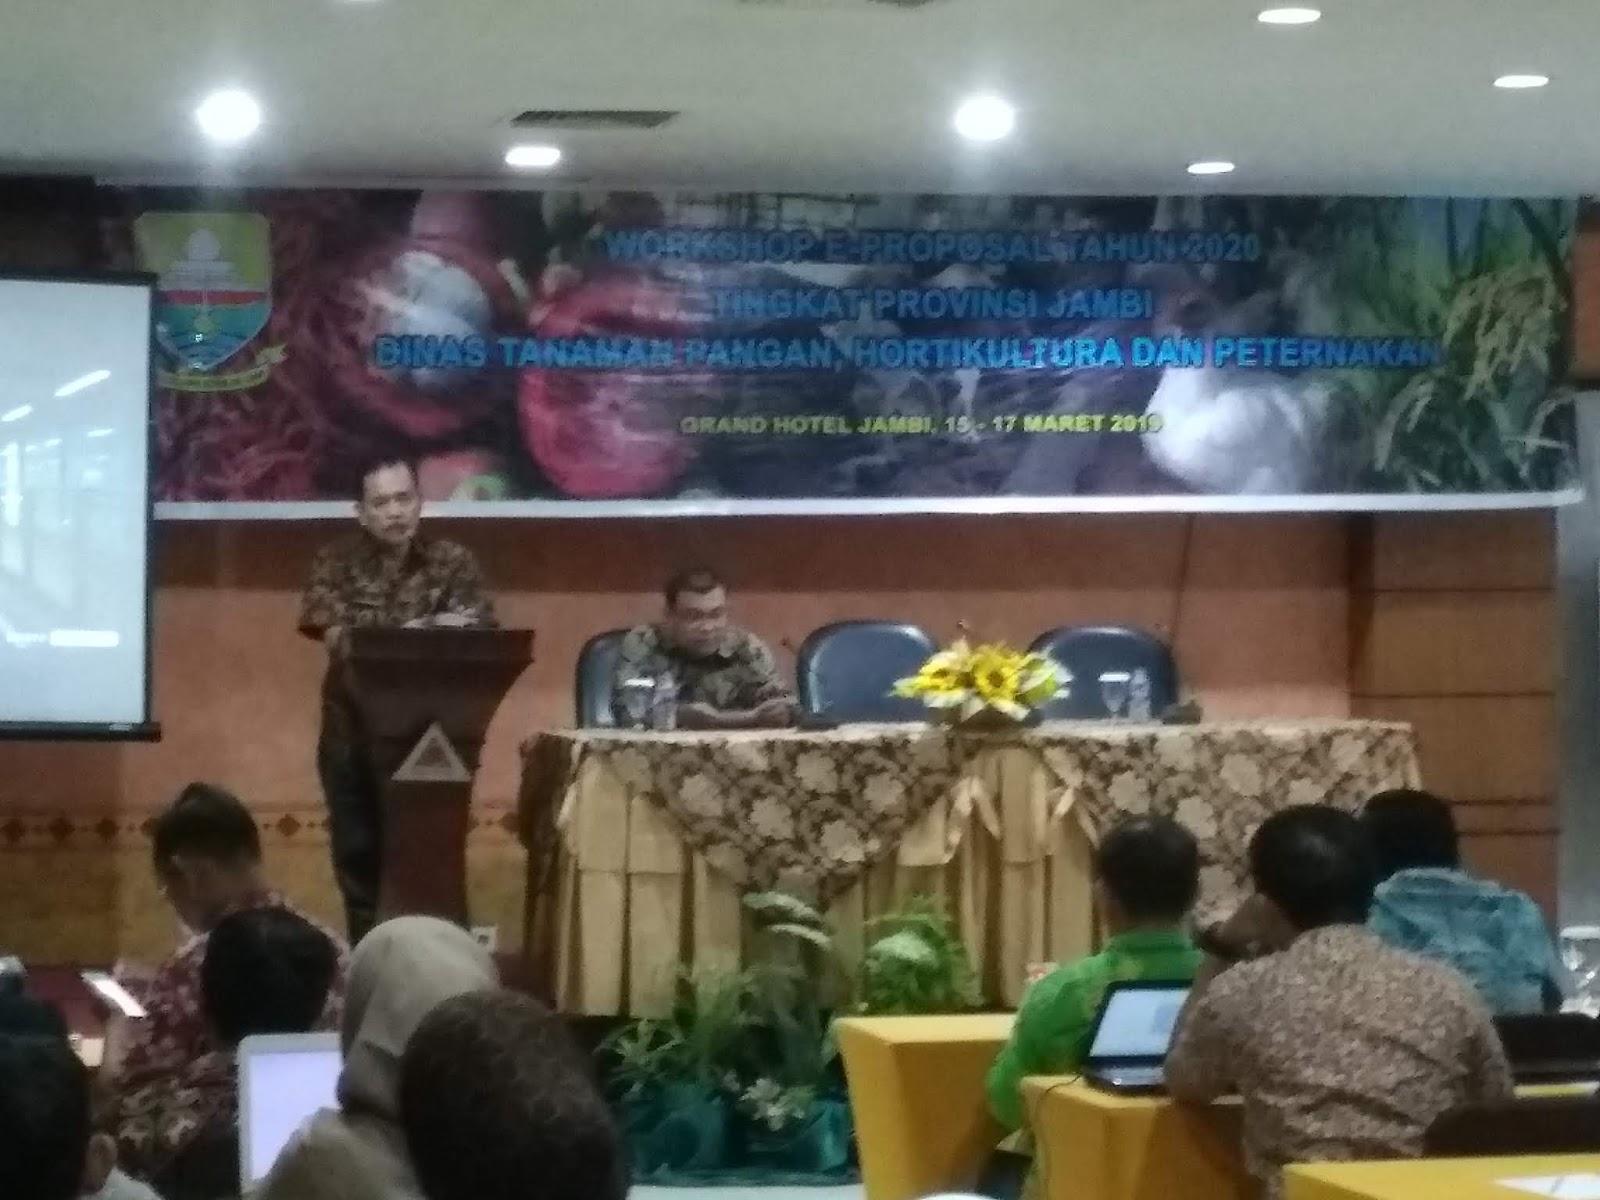 Sekretaris Dinas TPHP Buka Workshop E-proposal  Tahun 2020 Tingkat  Provinsi  Jambi.